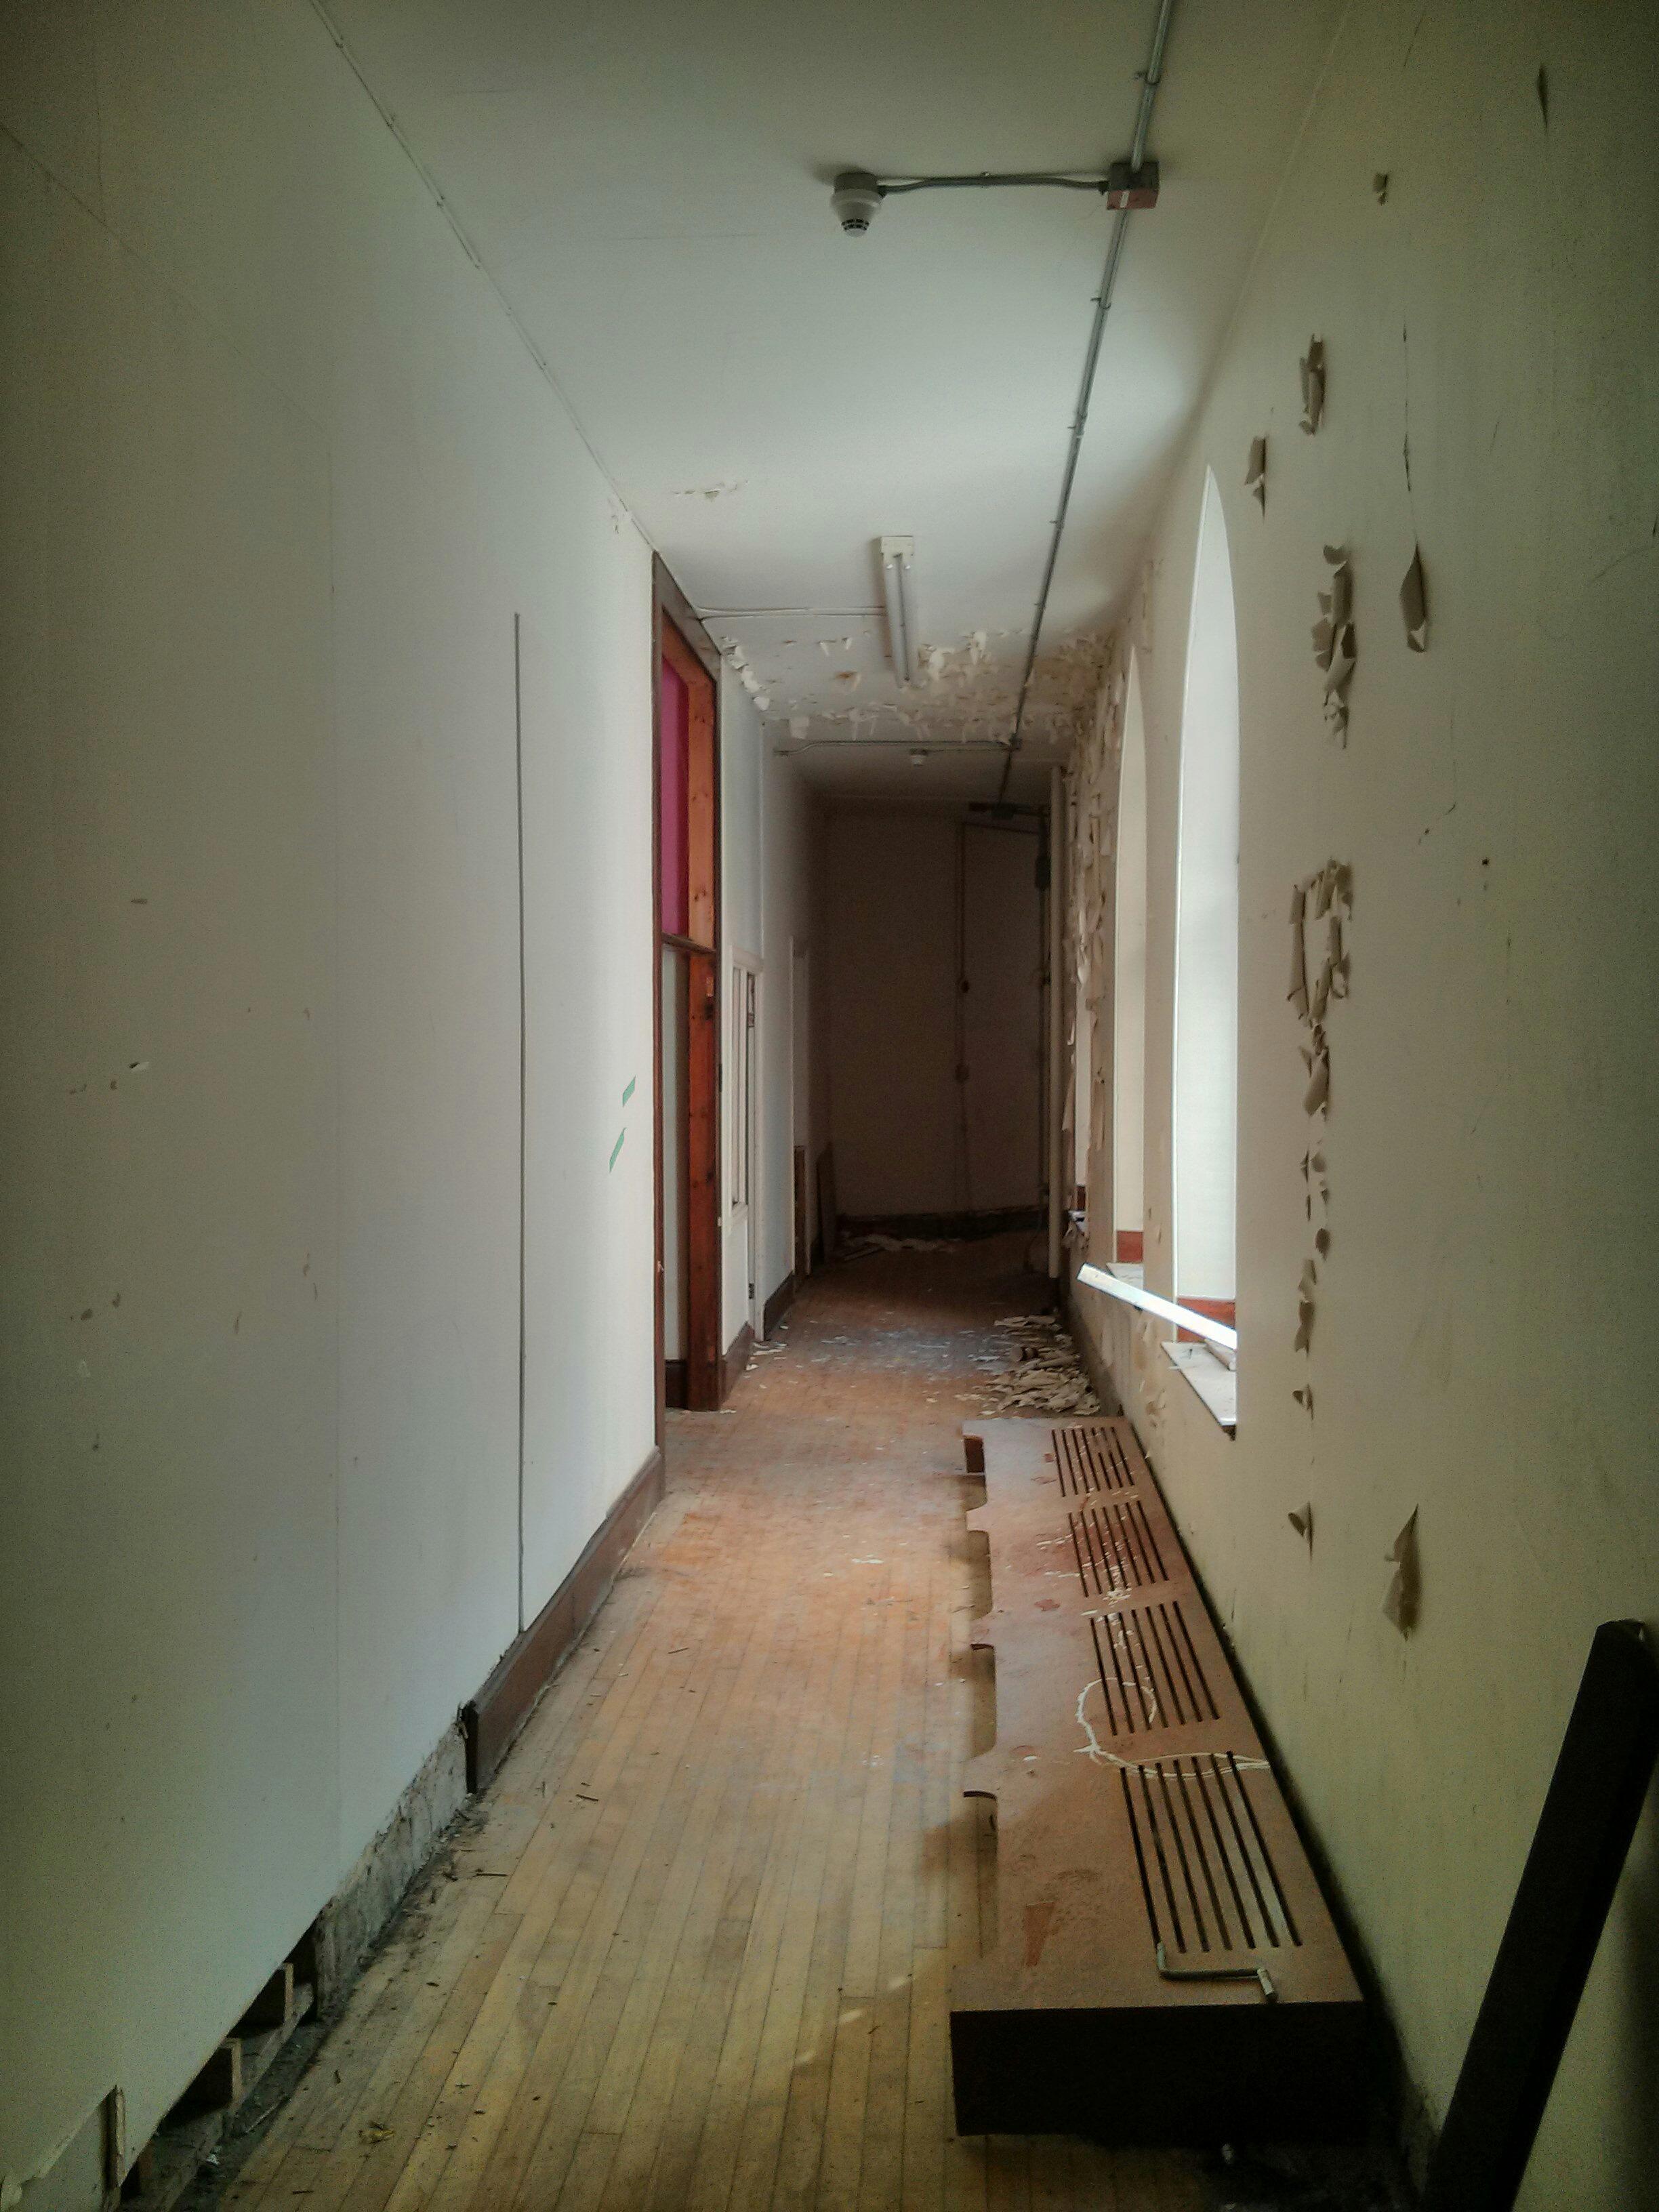 Convent of the Redemptoristines hallway